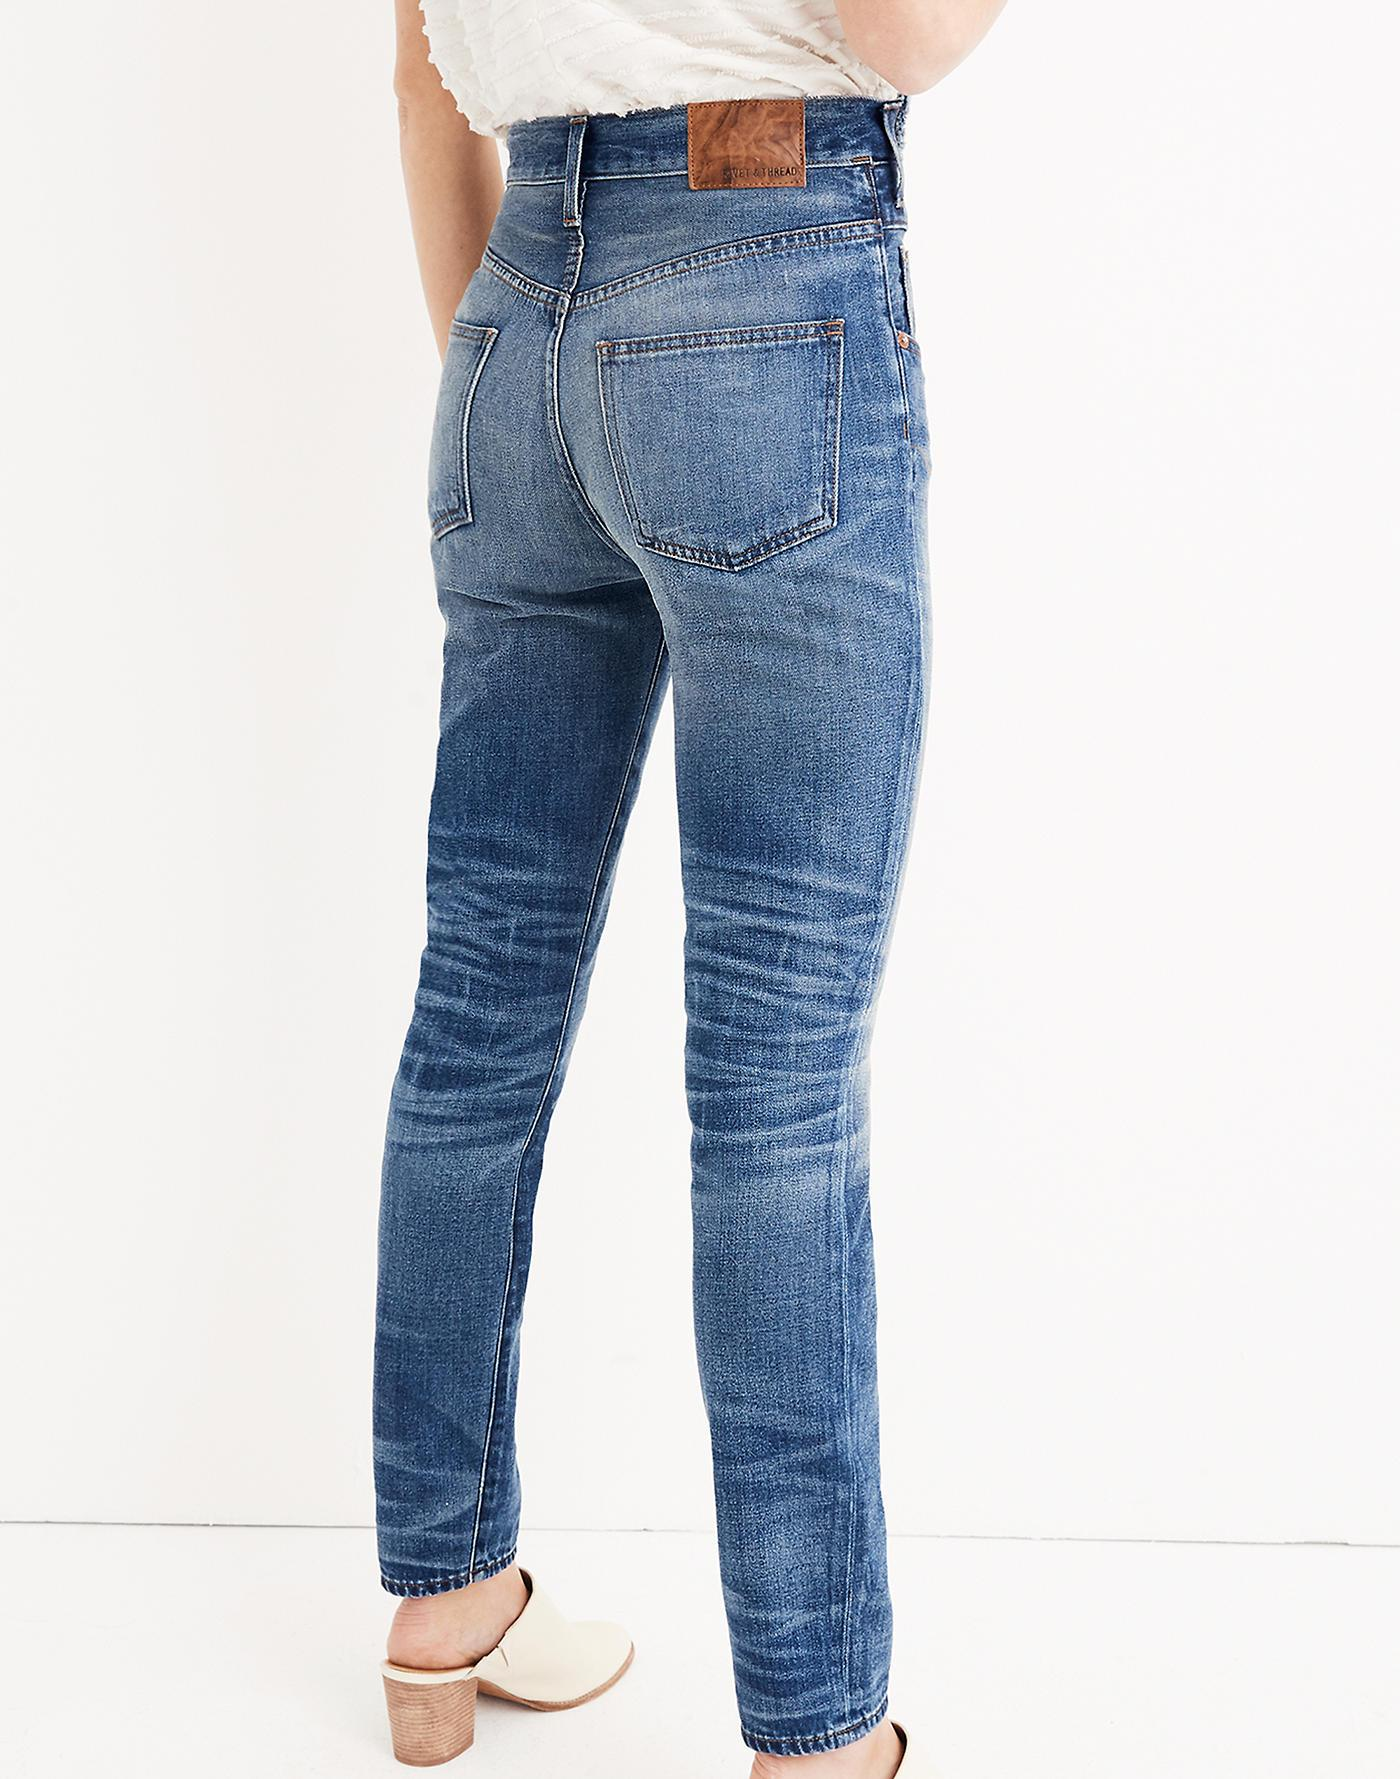 madewell-candiani-jeans-1573590304387.jpeg